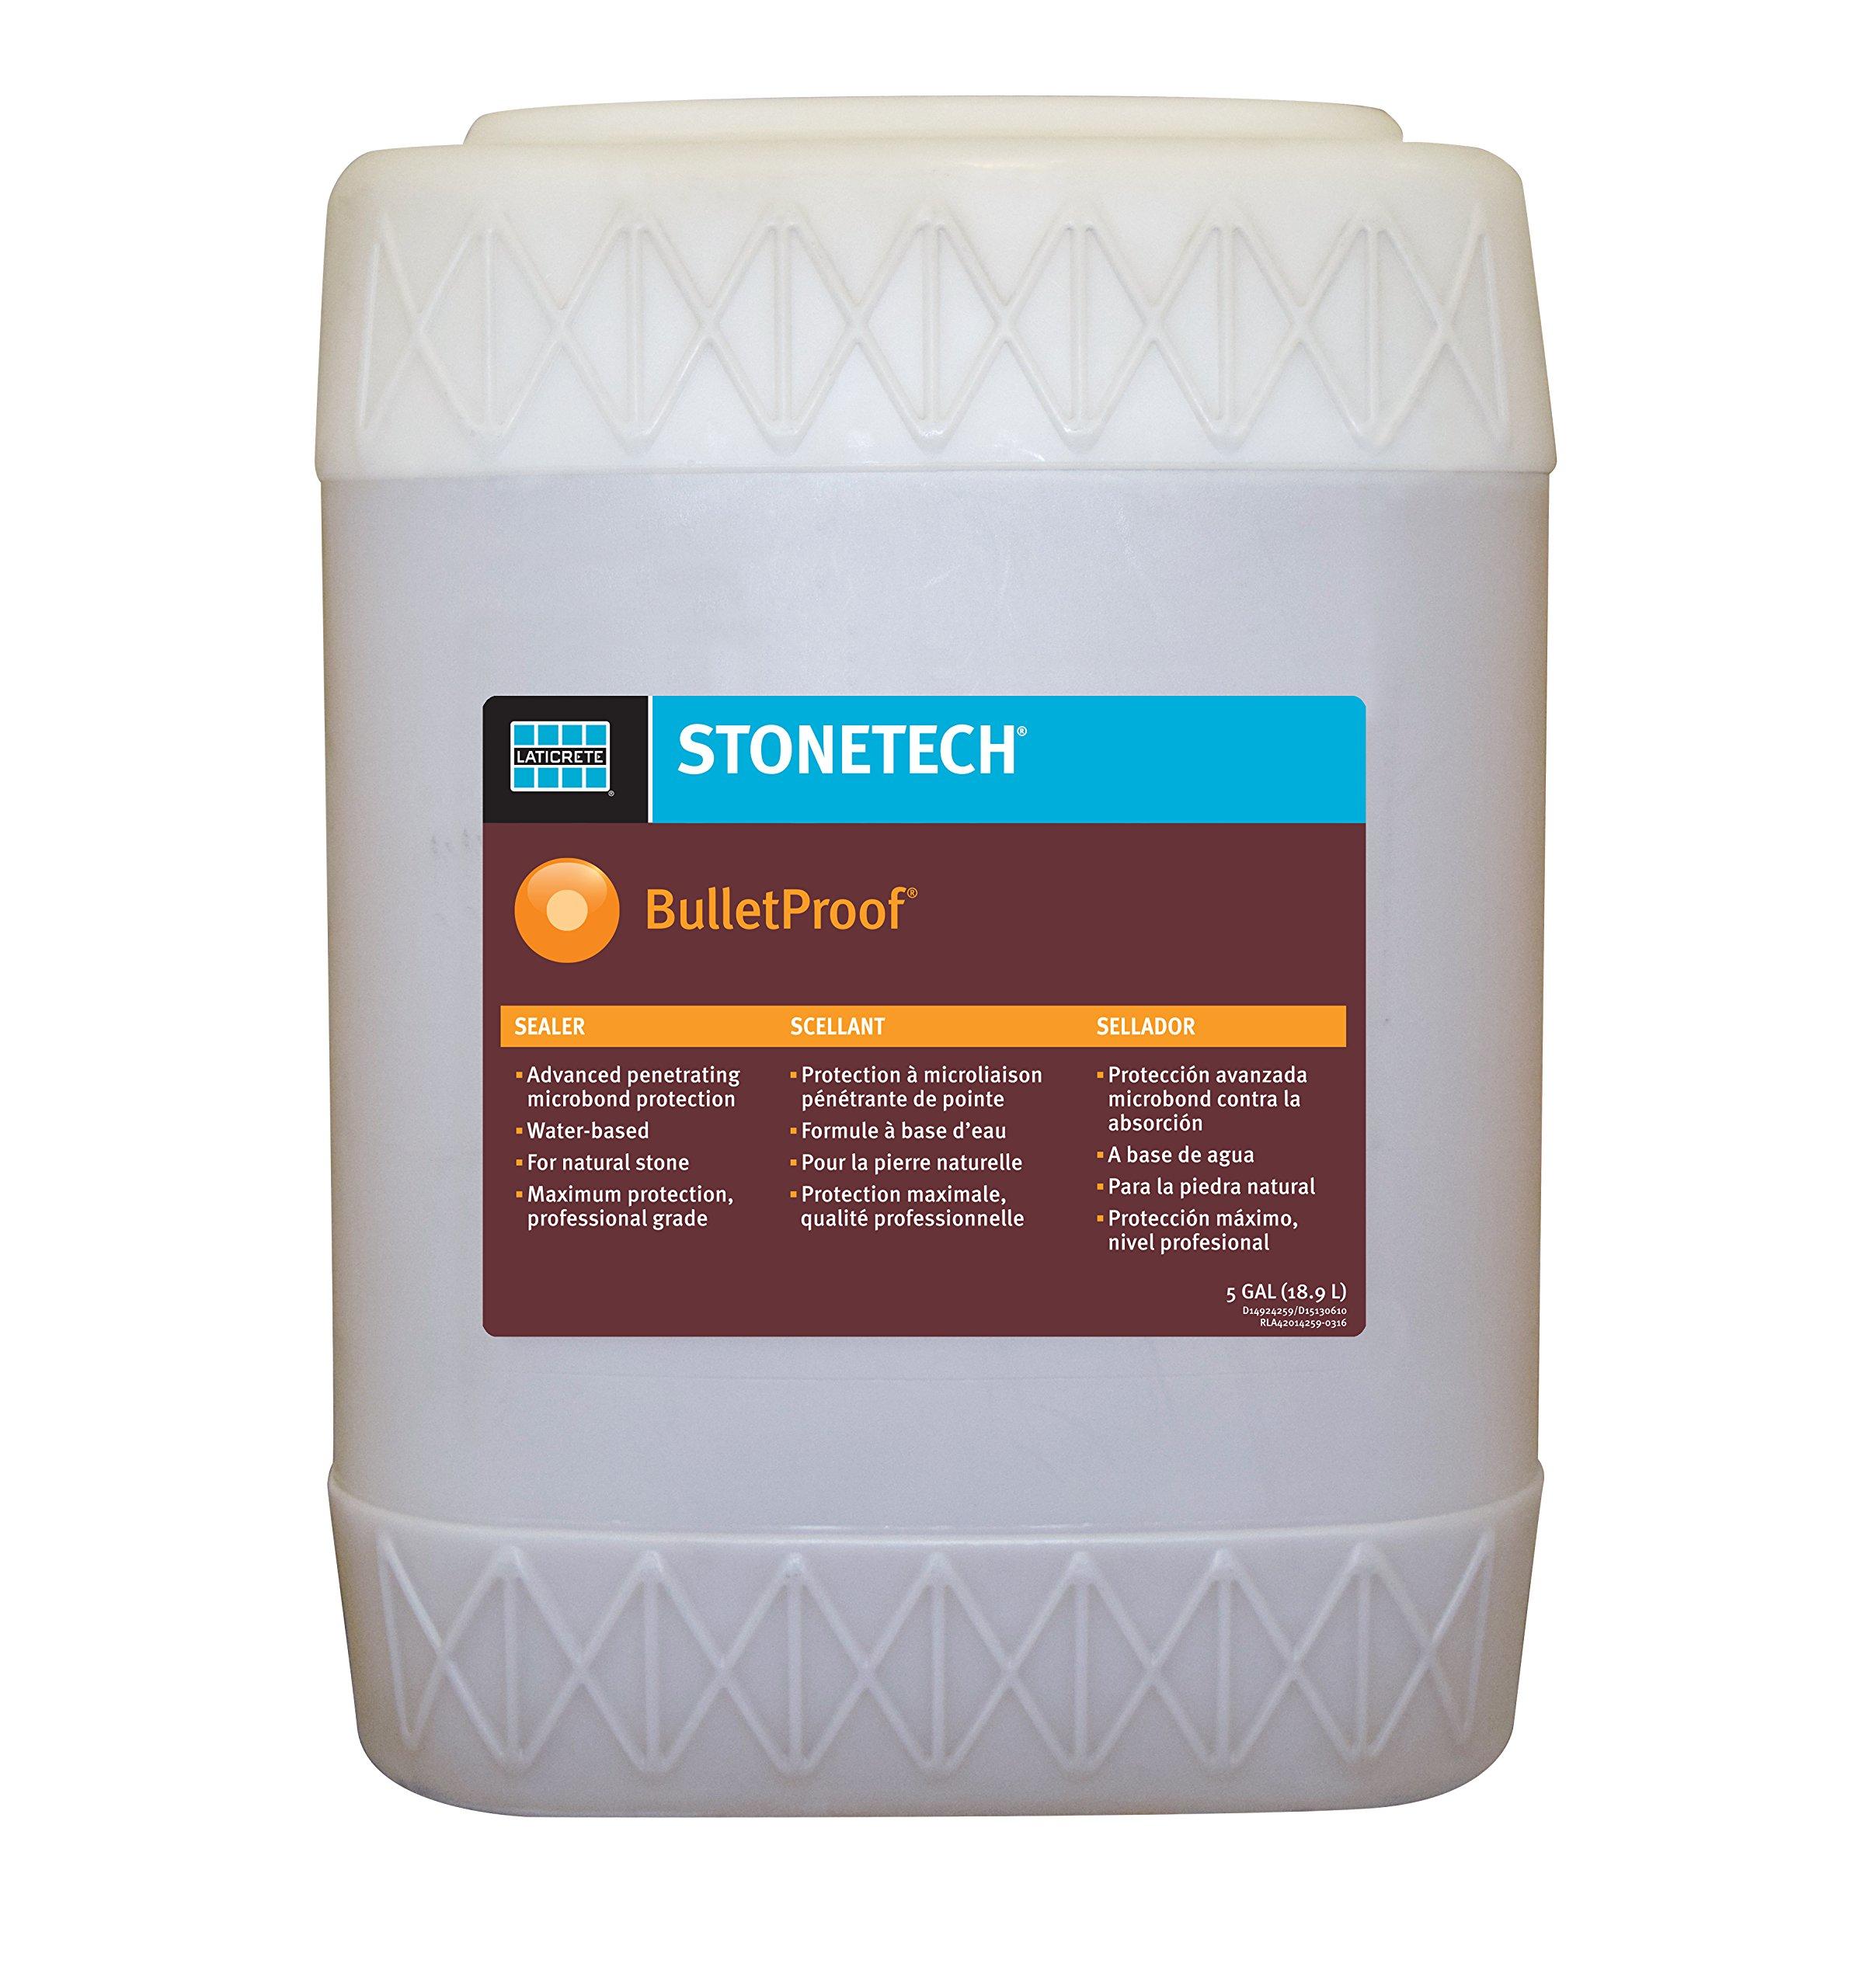 Laticrete Stonetech Bulletproof Sealer - 5 Gallon